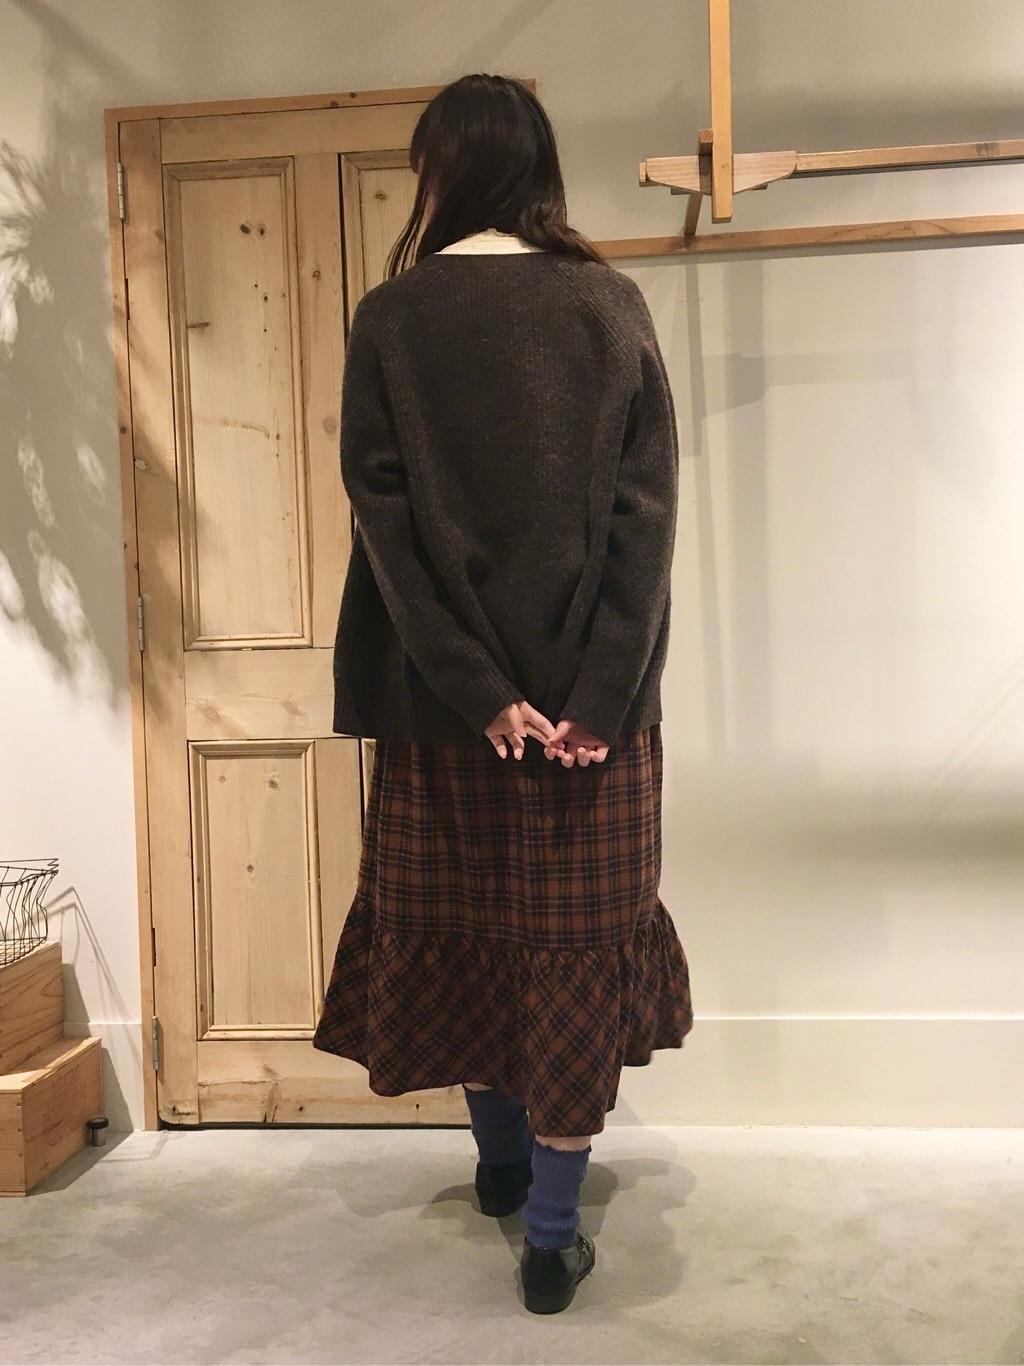 Malle chambre de charme 調布パルコ 身長:167cm 2019.10.30